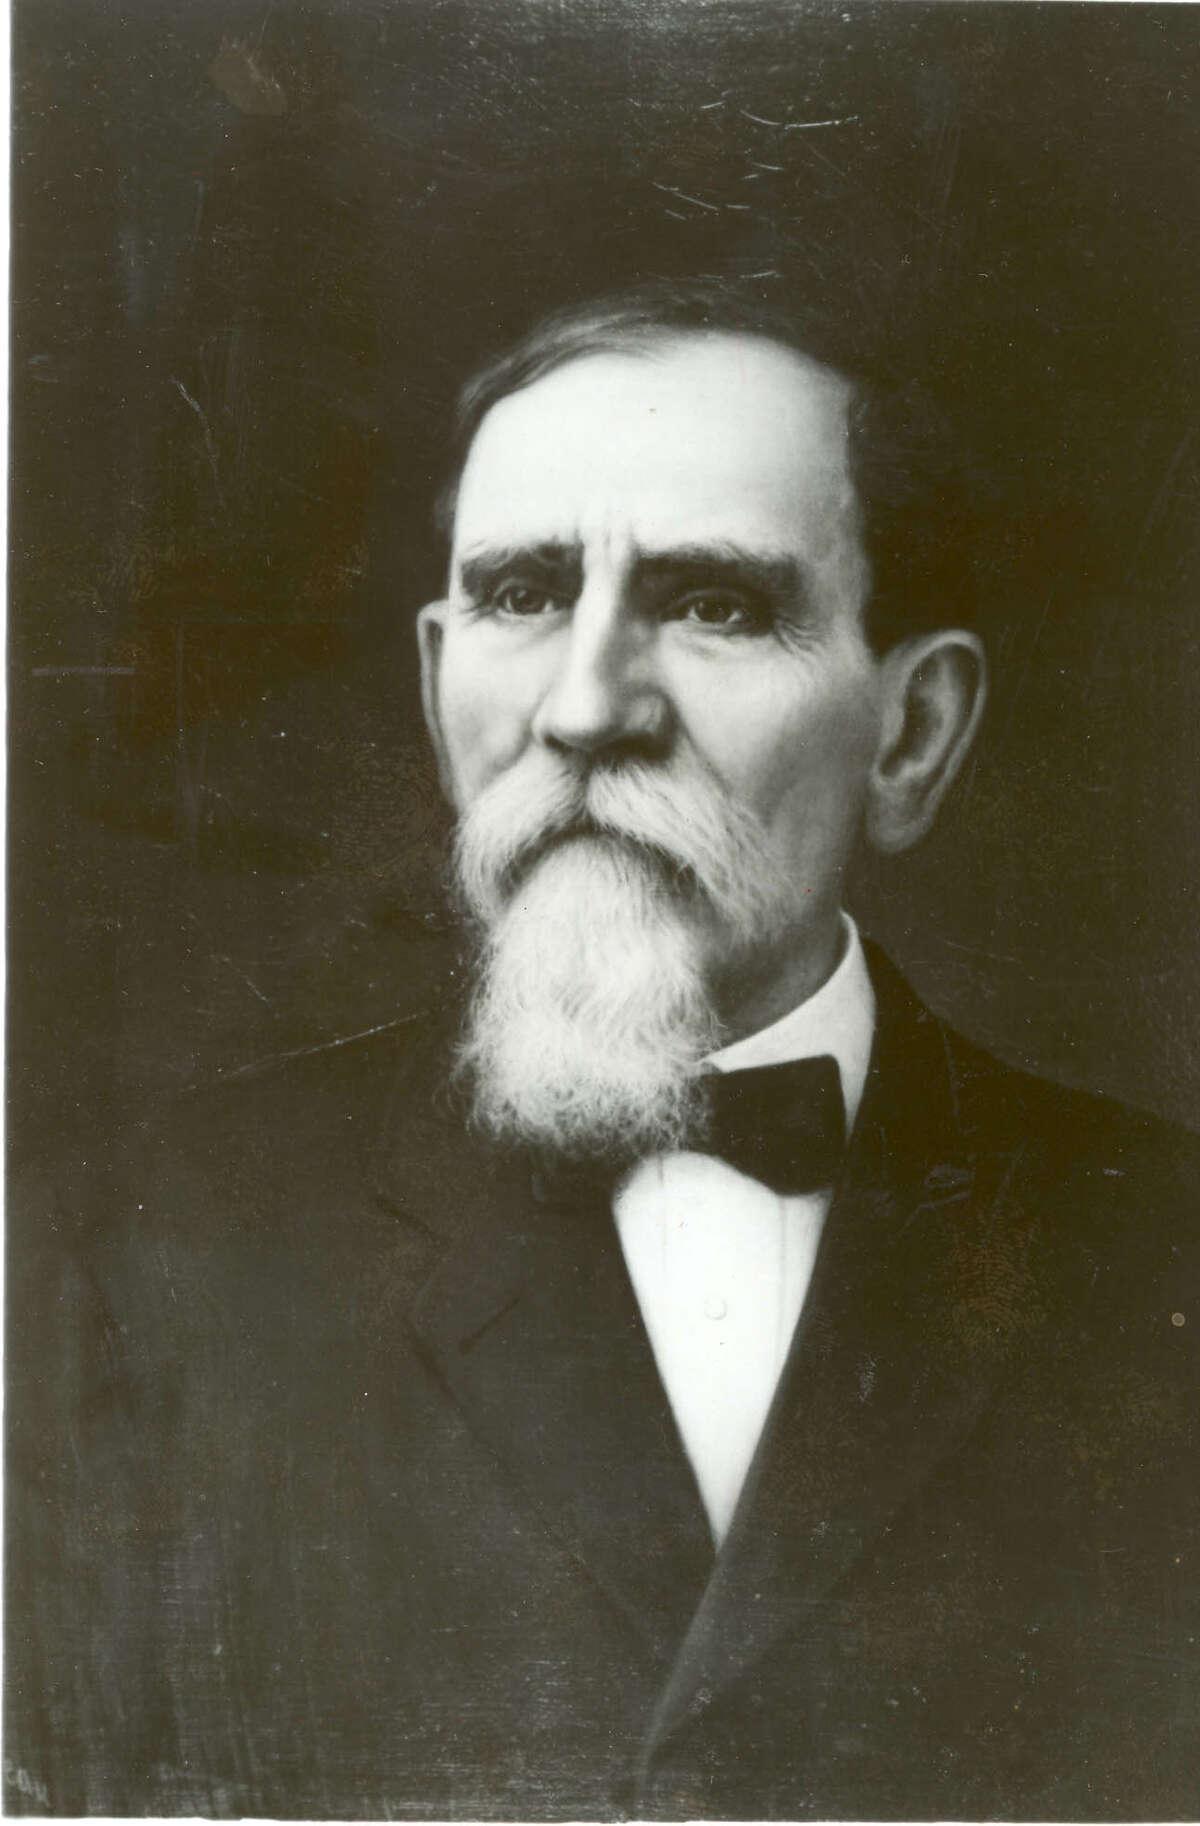 Philanthropist George Hermann gave Houstonians Hermann Park and what is now Memorial Hermann Hospital -- Texas Medical Center.